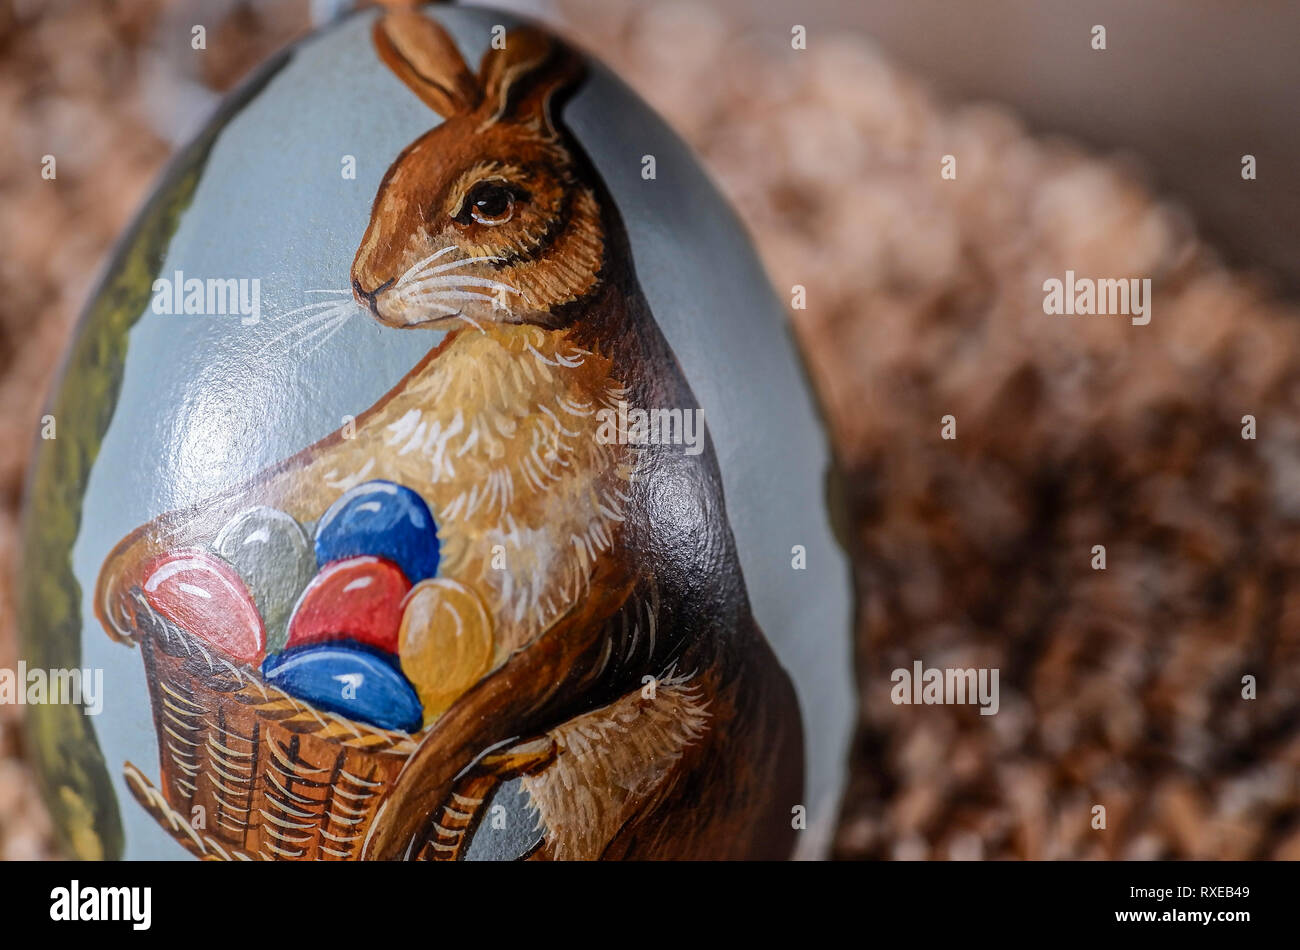 Ostereier Bemalte Deko - dipinti uova di pasqua deco Immagini Stock